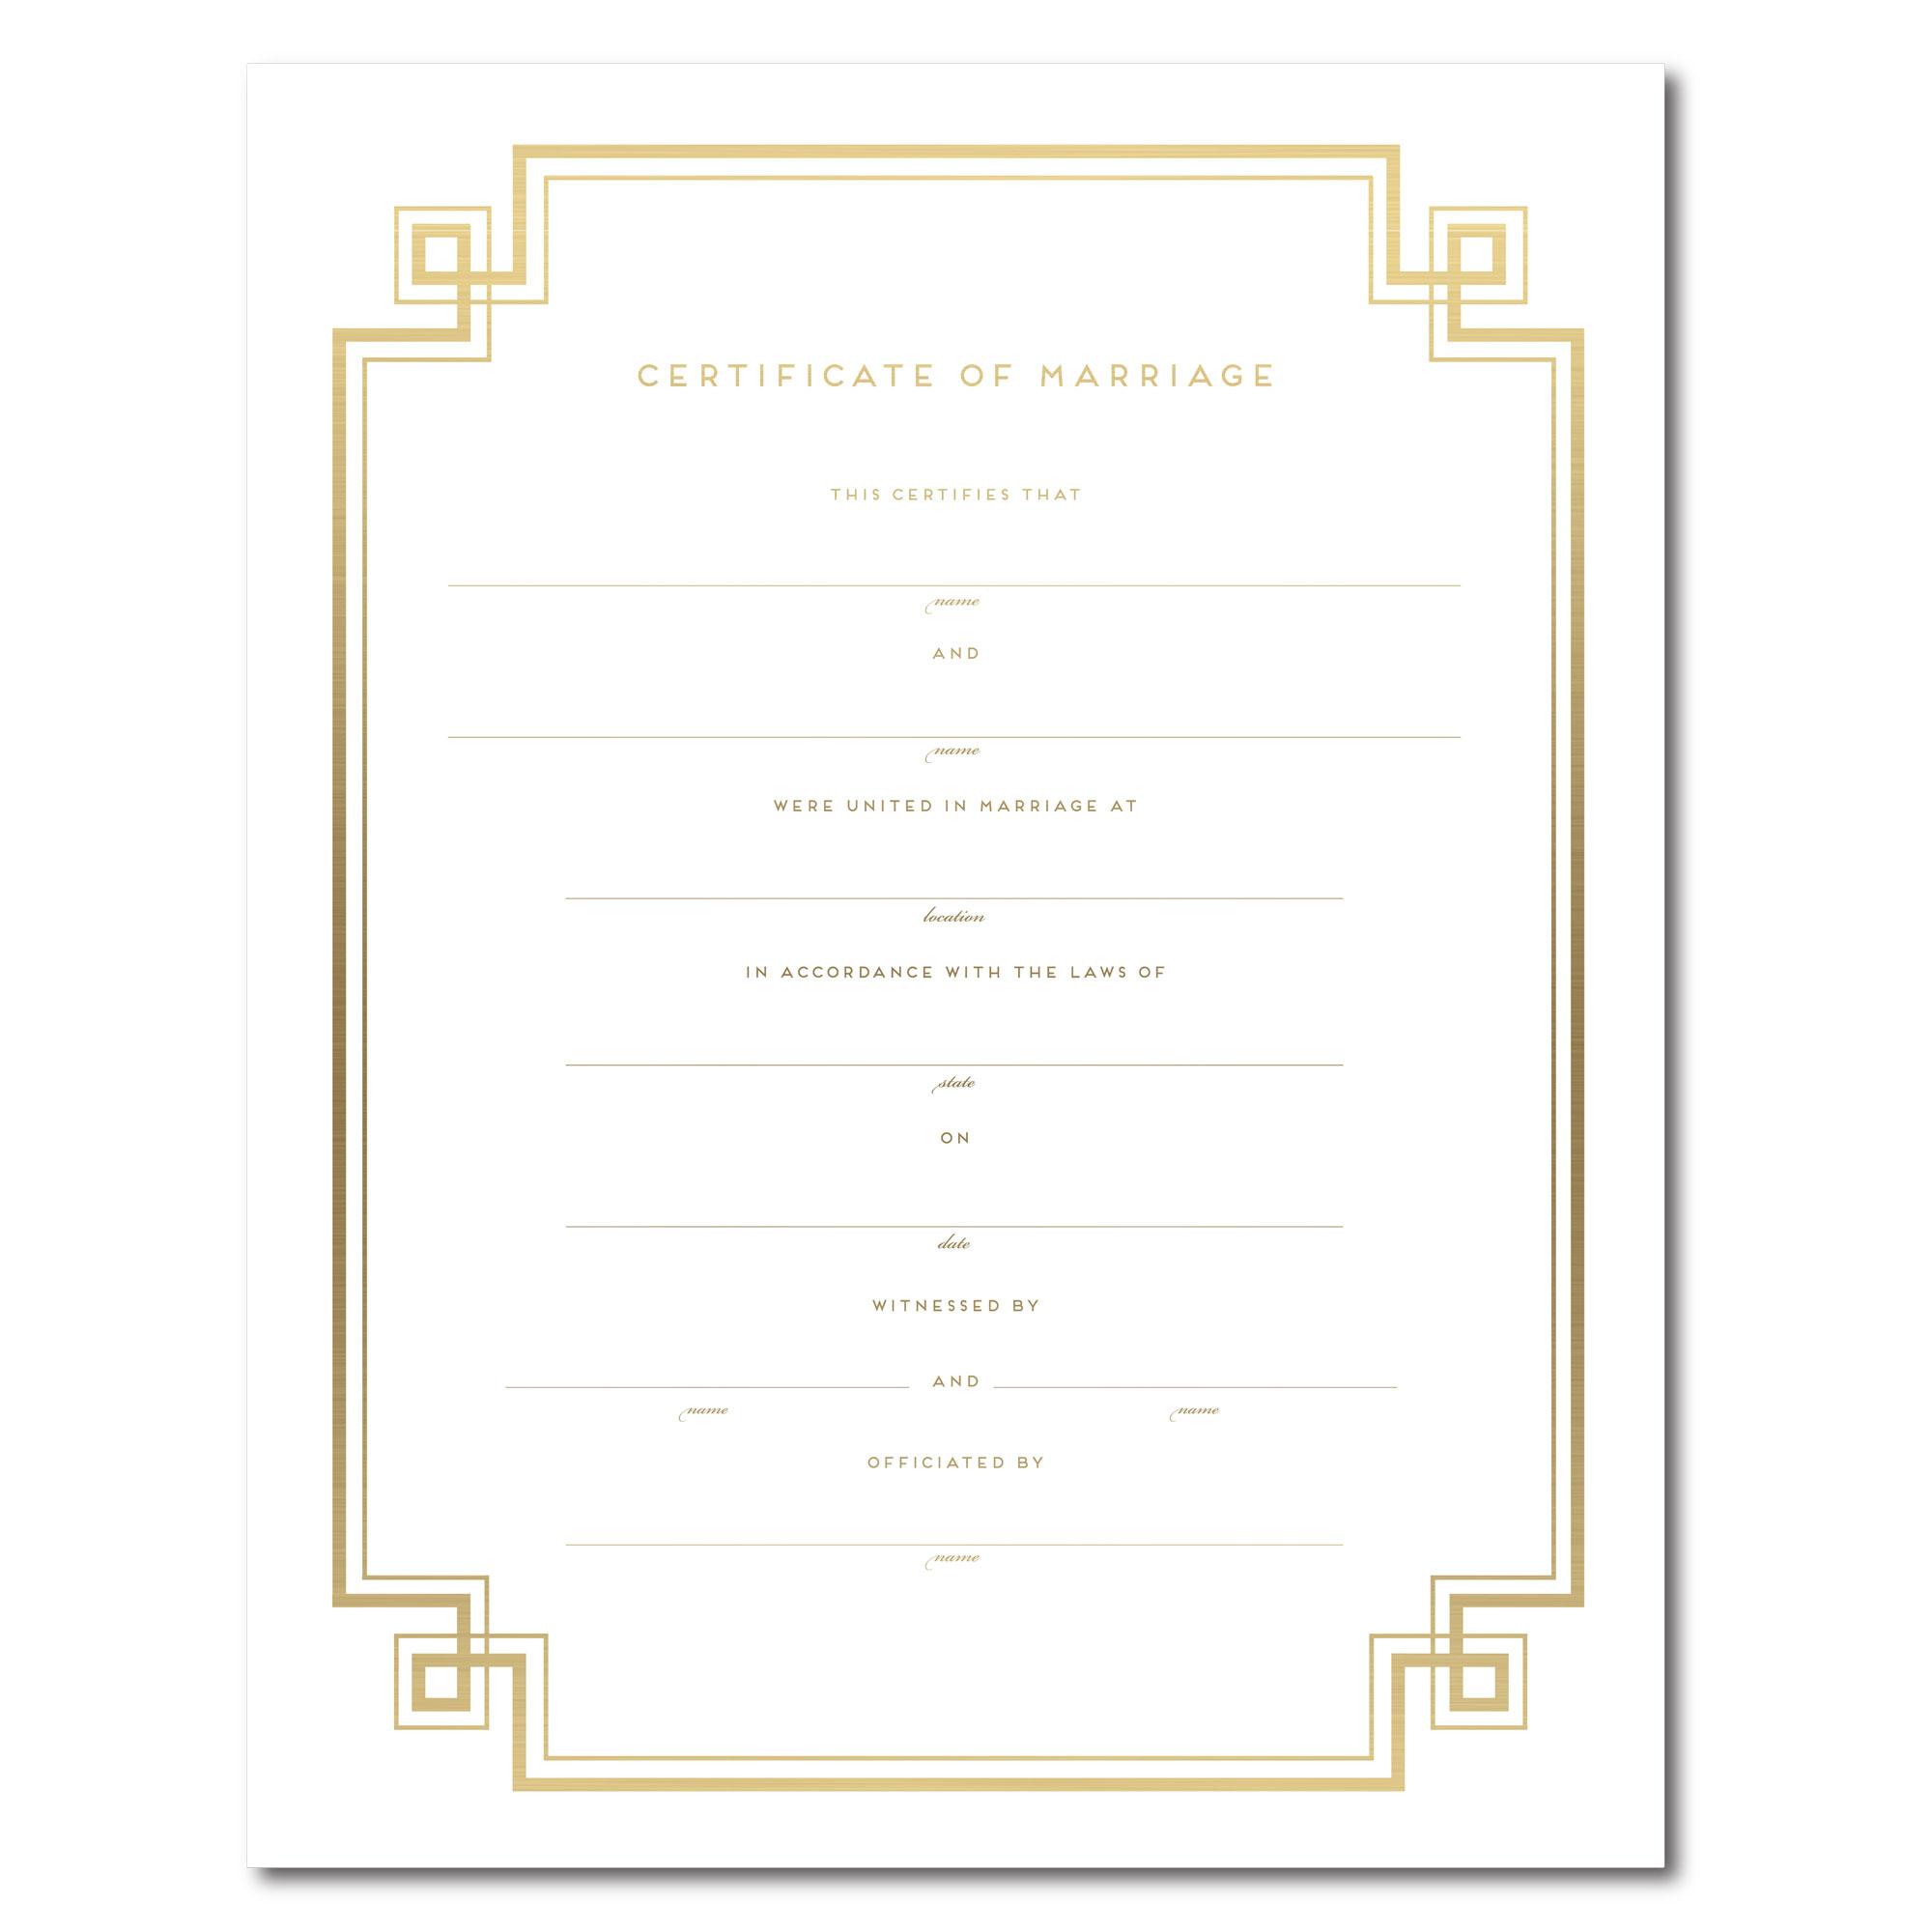 CertificateWeddingM.jpg